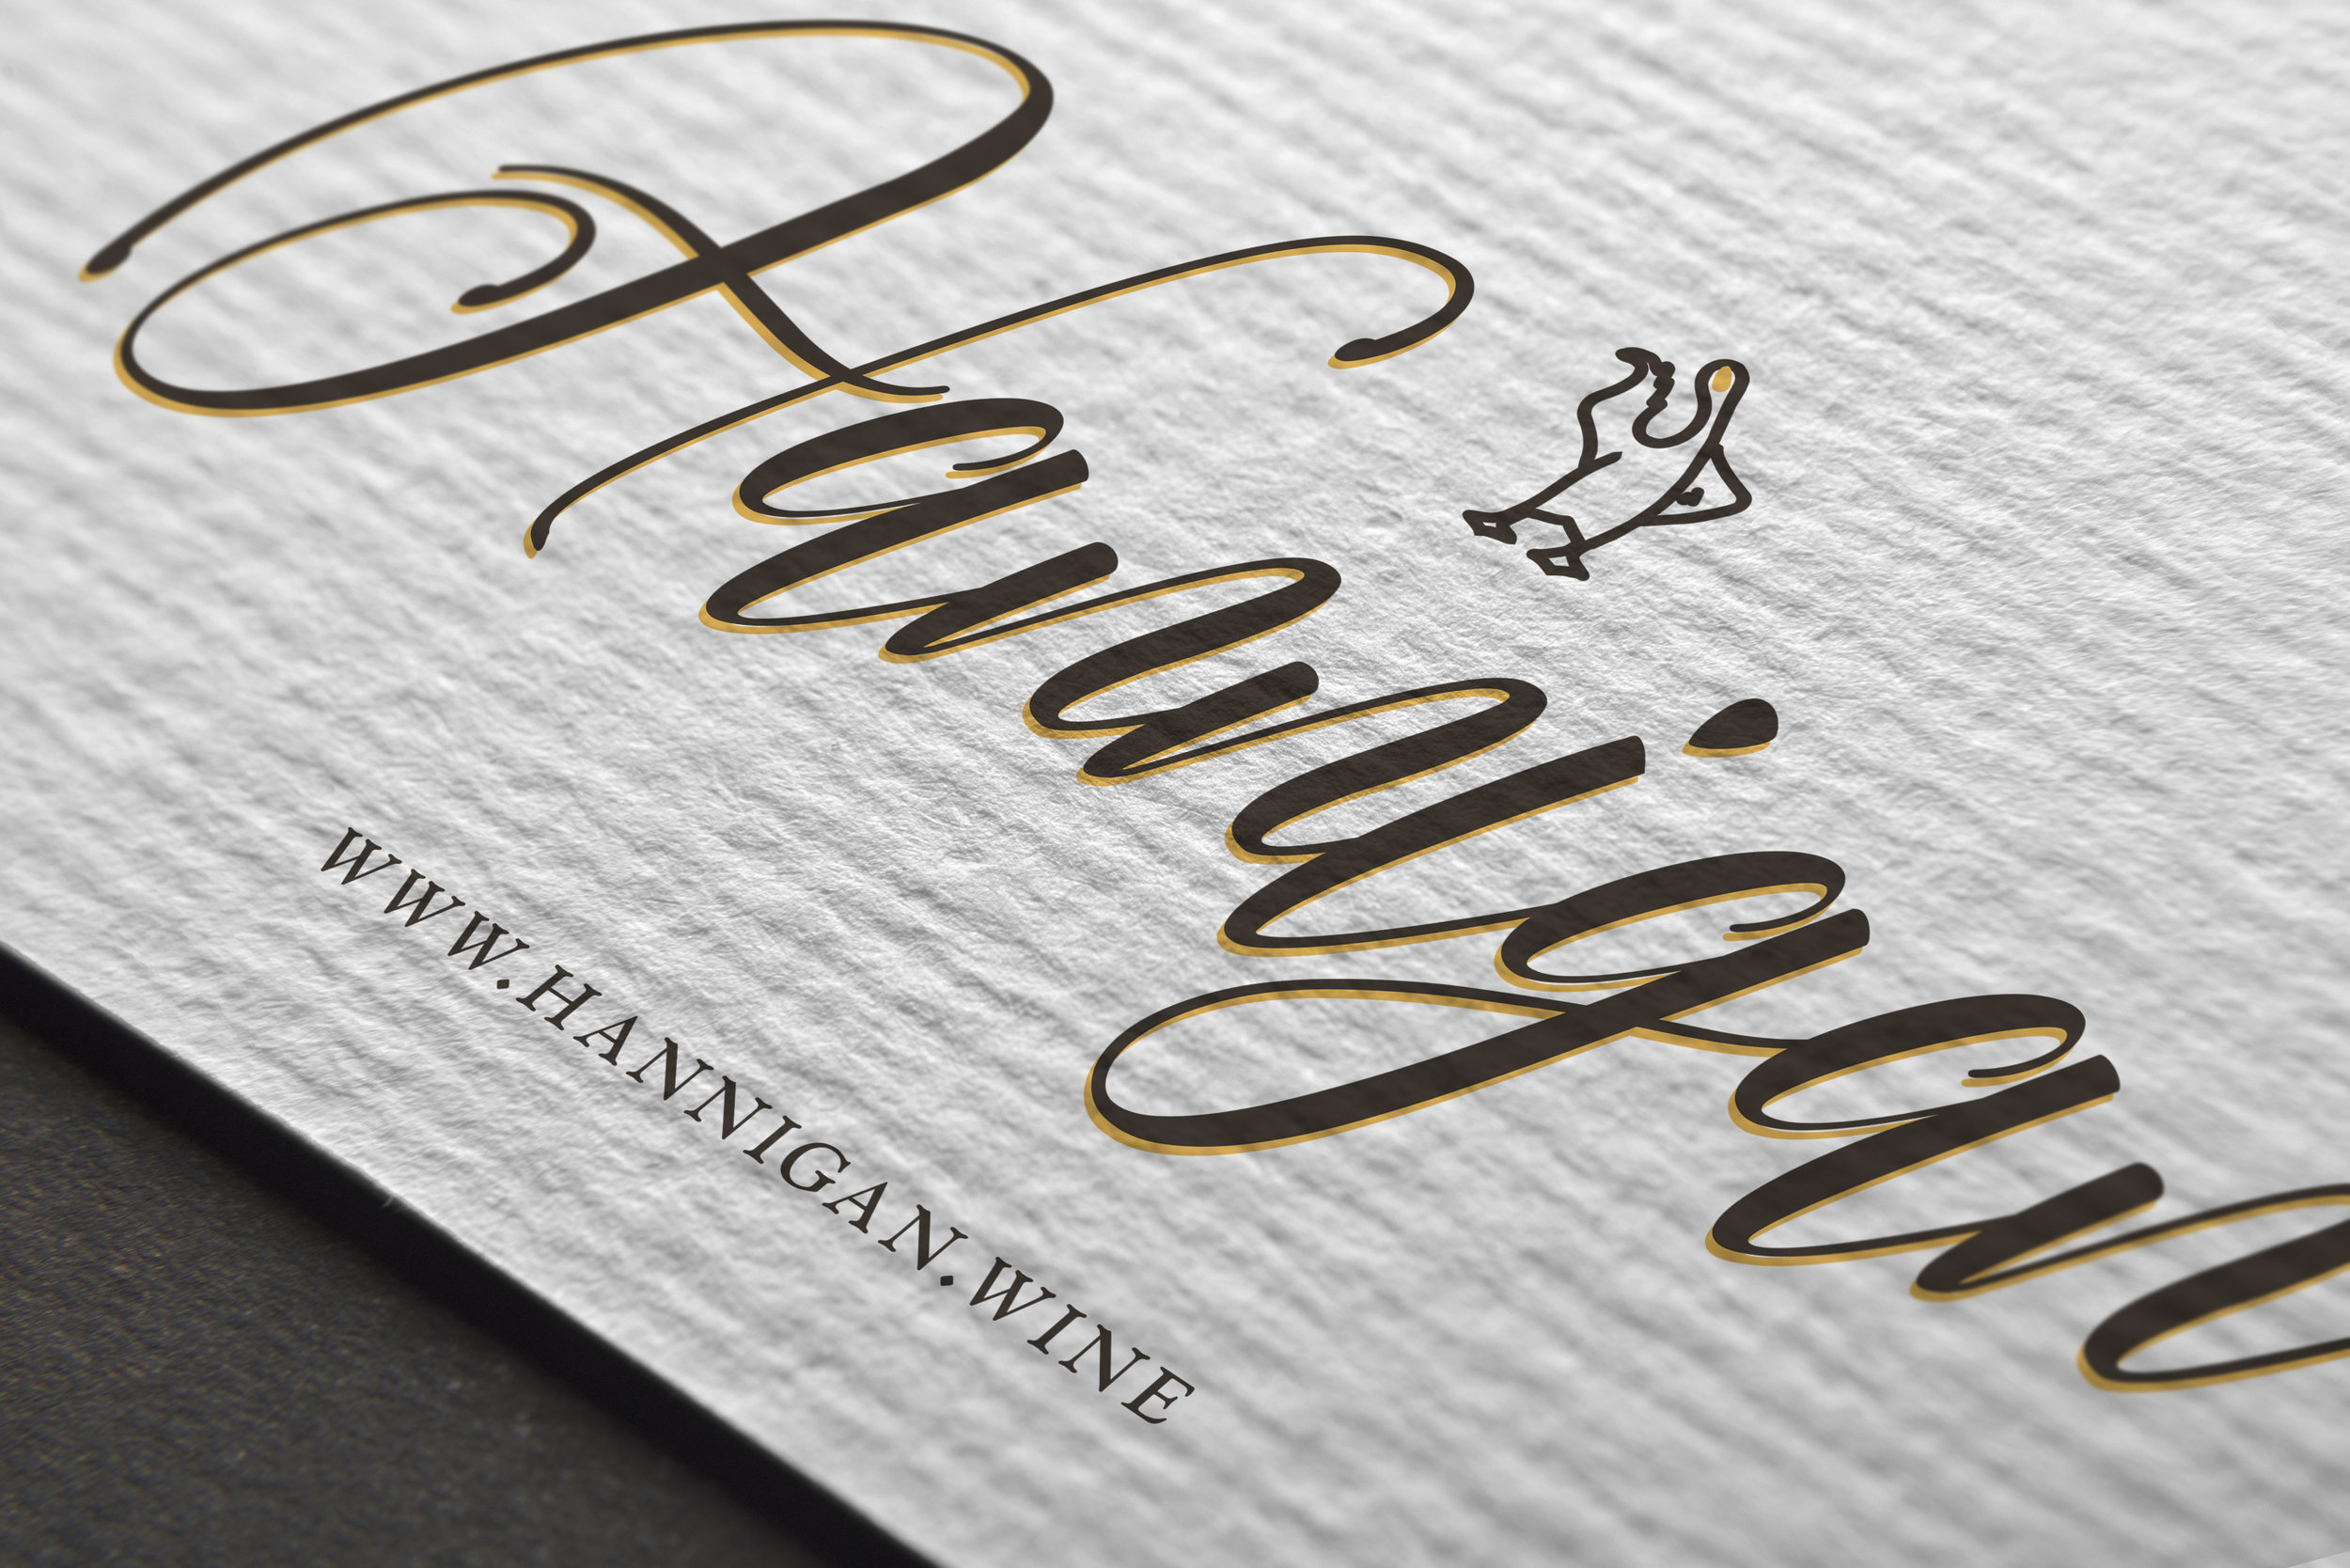 hannigan-02-logo-mockup.jpg